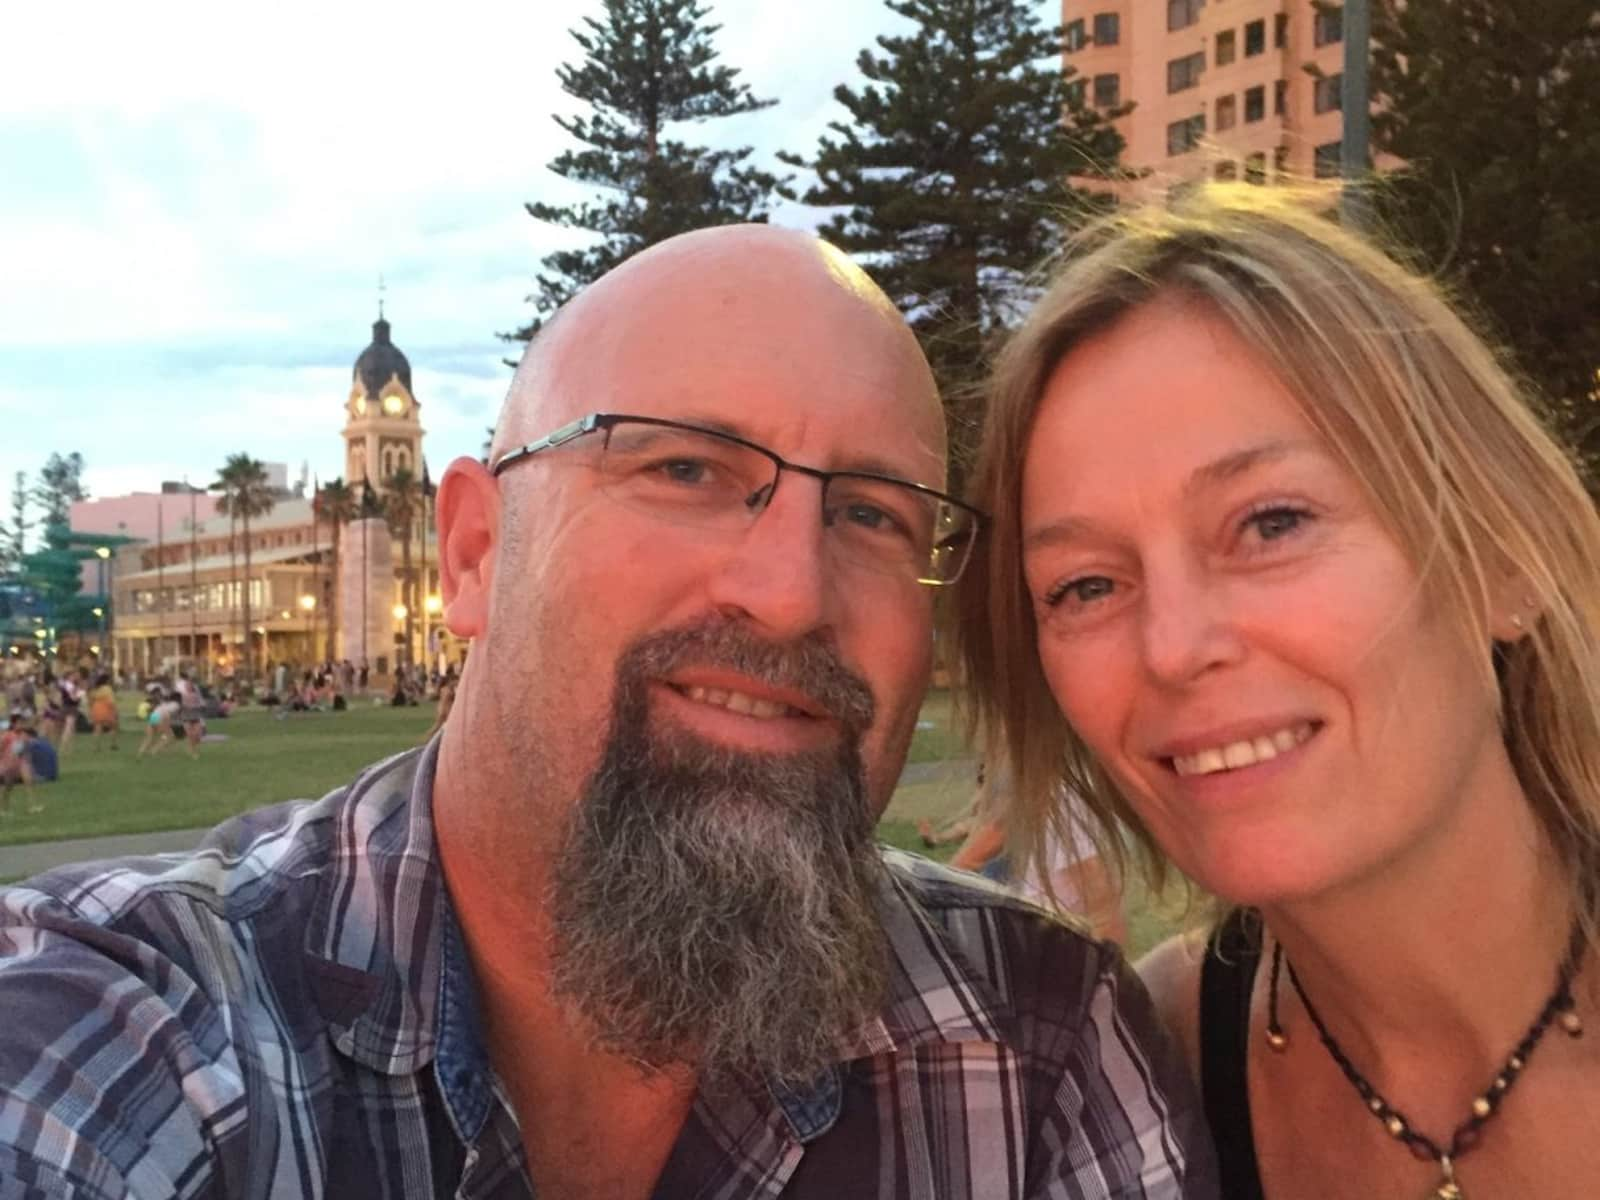 Hayley & Juan from Darwin, Northern Territory, Australia